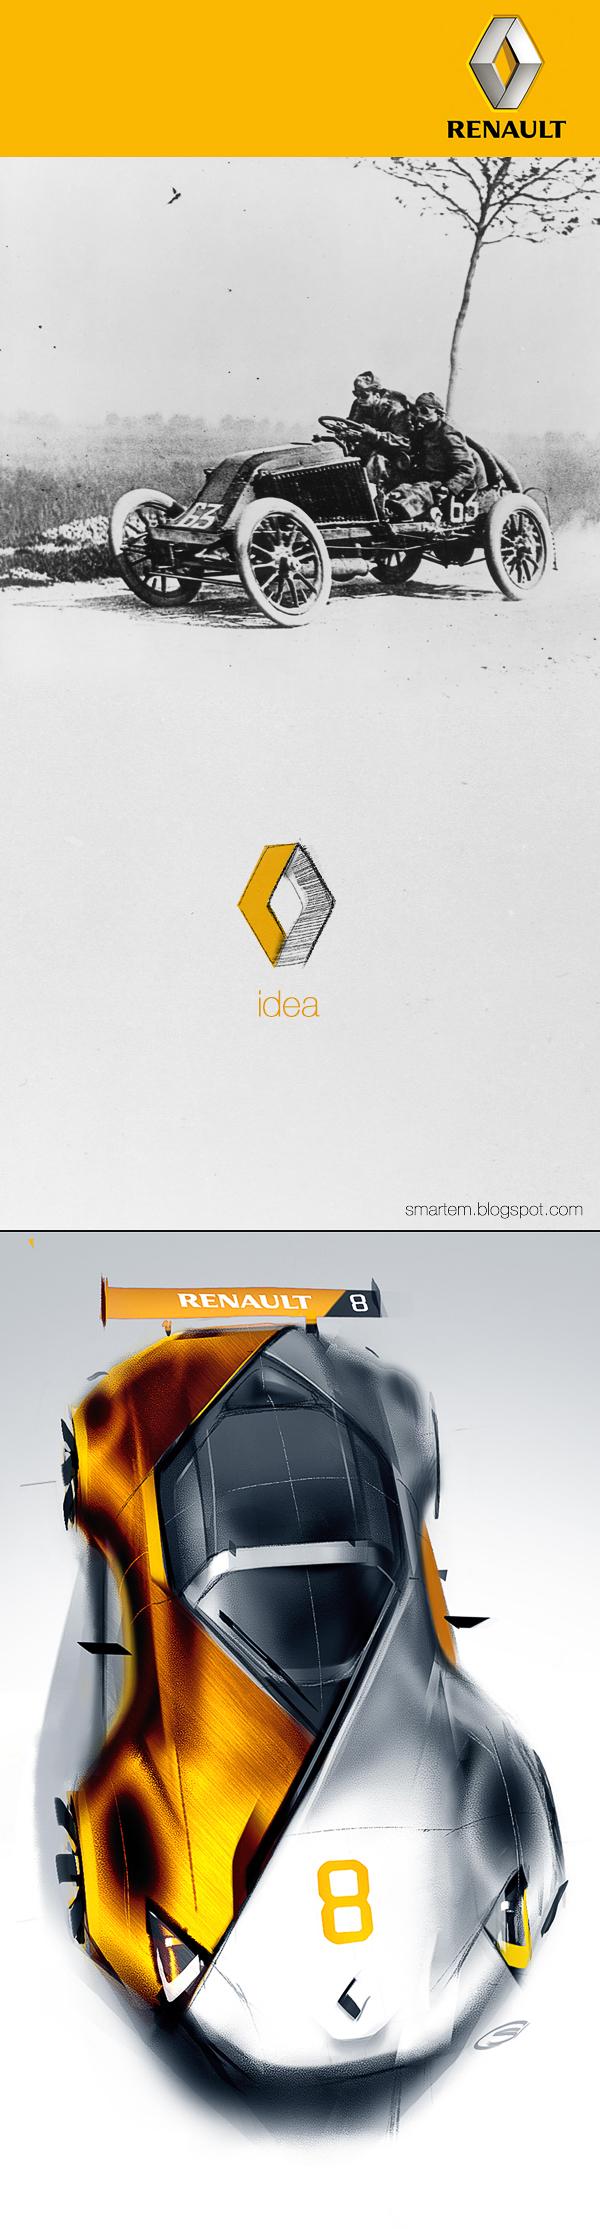 Renault_8 on Behance